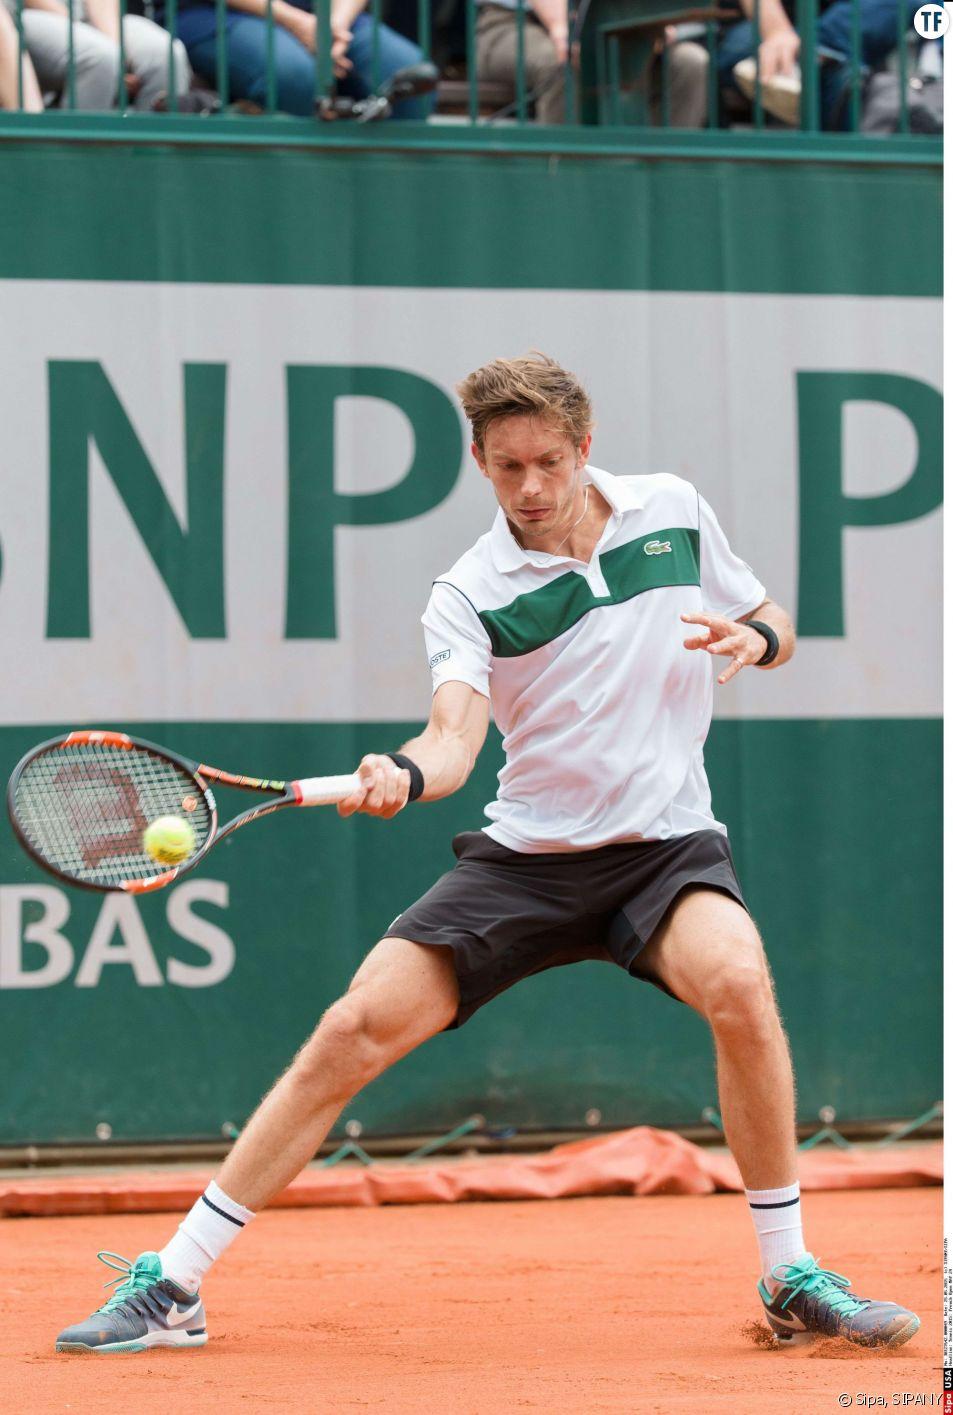 Nicolas Mahut contre Kimmer Coppejans dimanche 24 mai 2015 à Roland Garros.